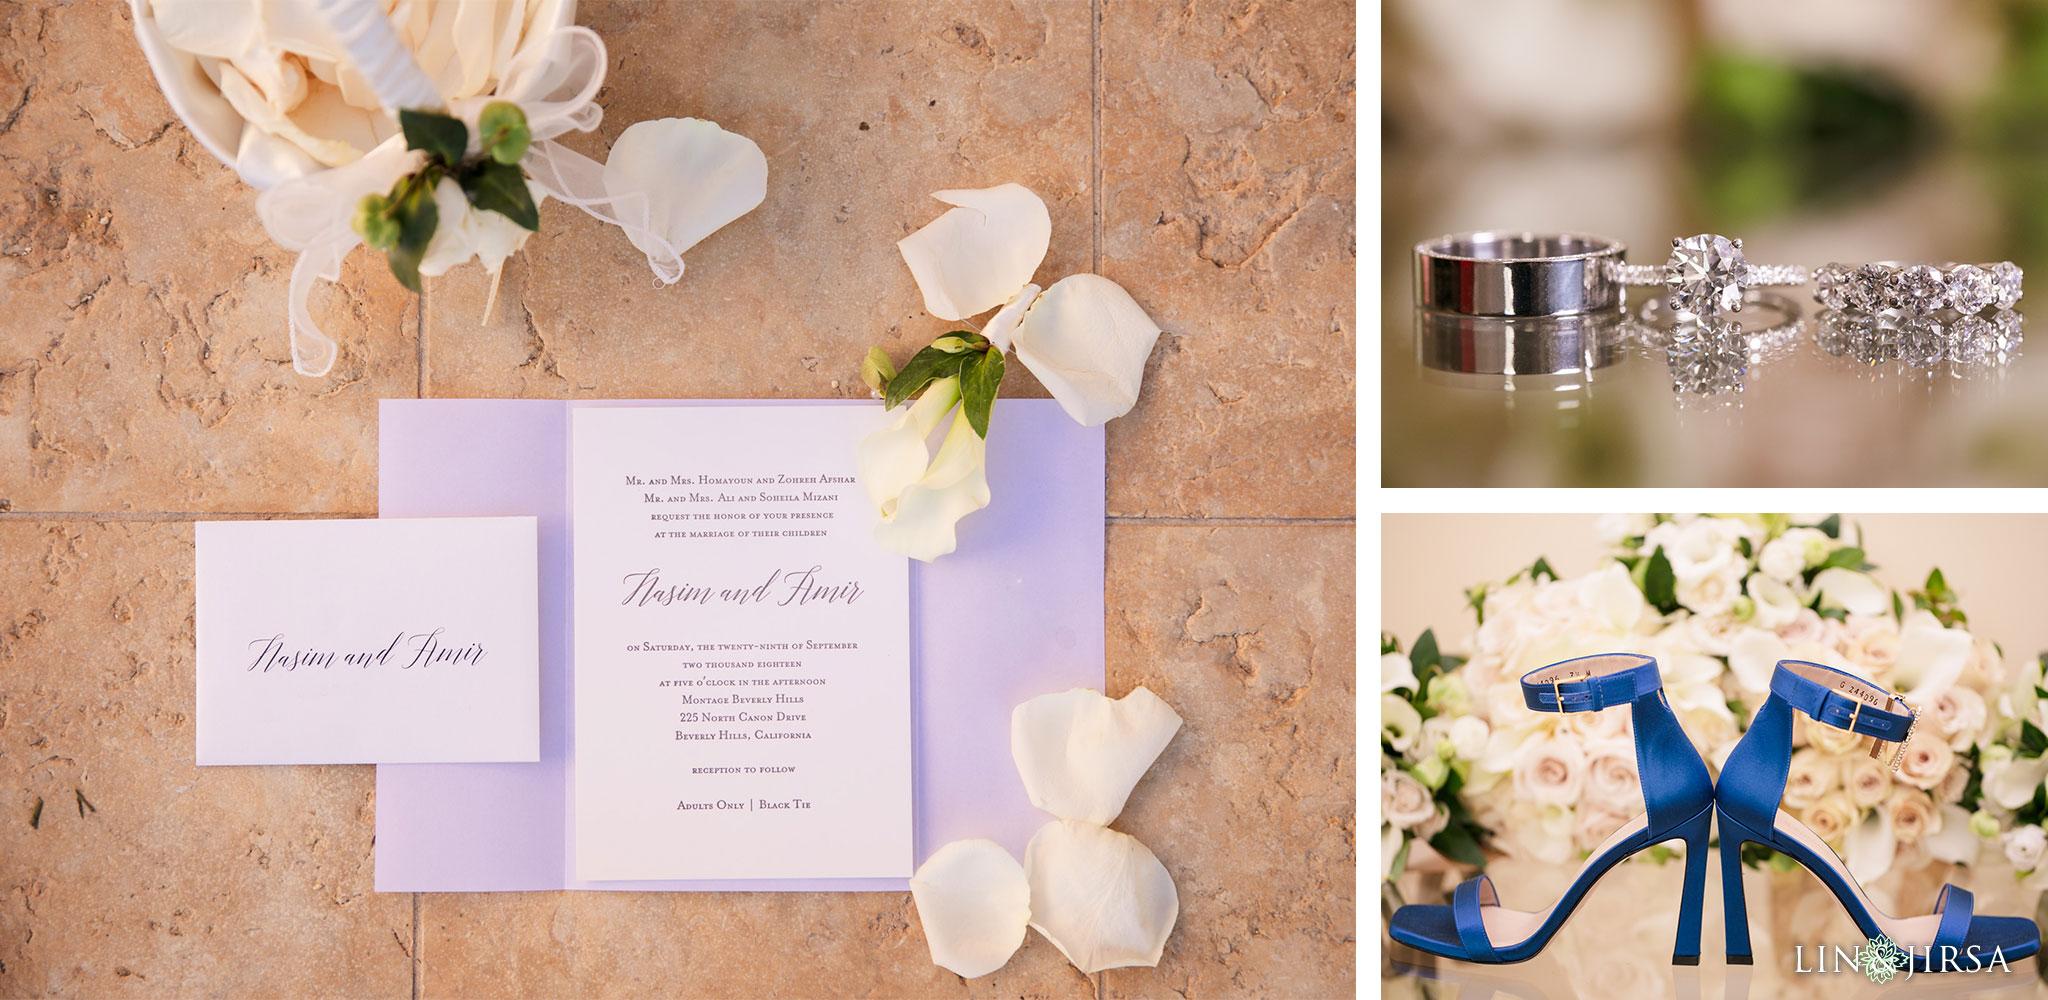 zmsantos montage beverly hills persian wedding photography